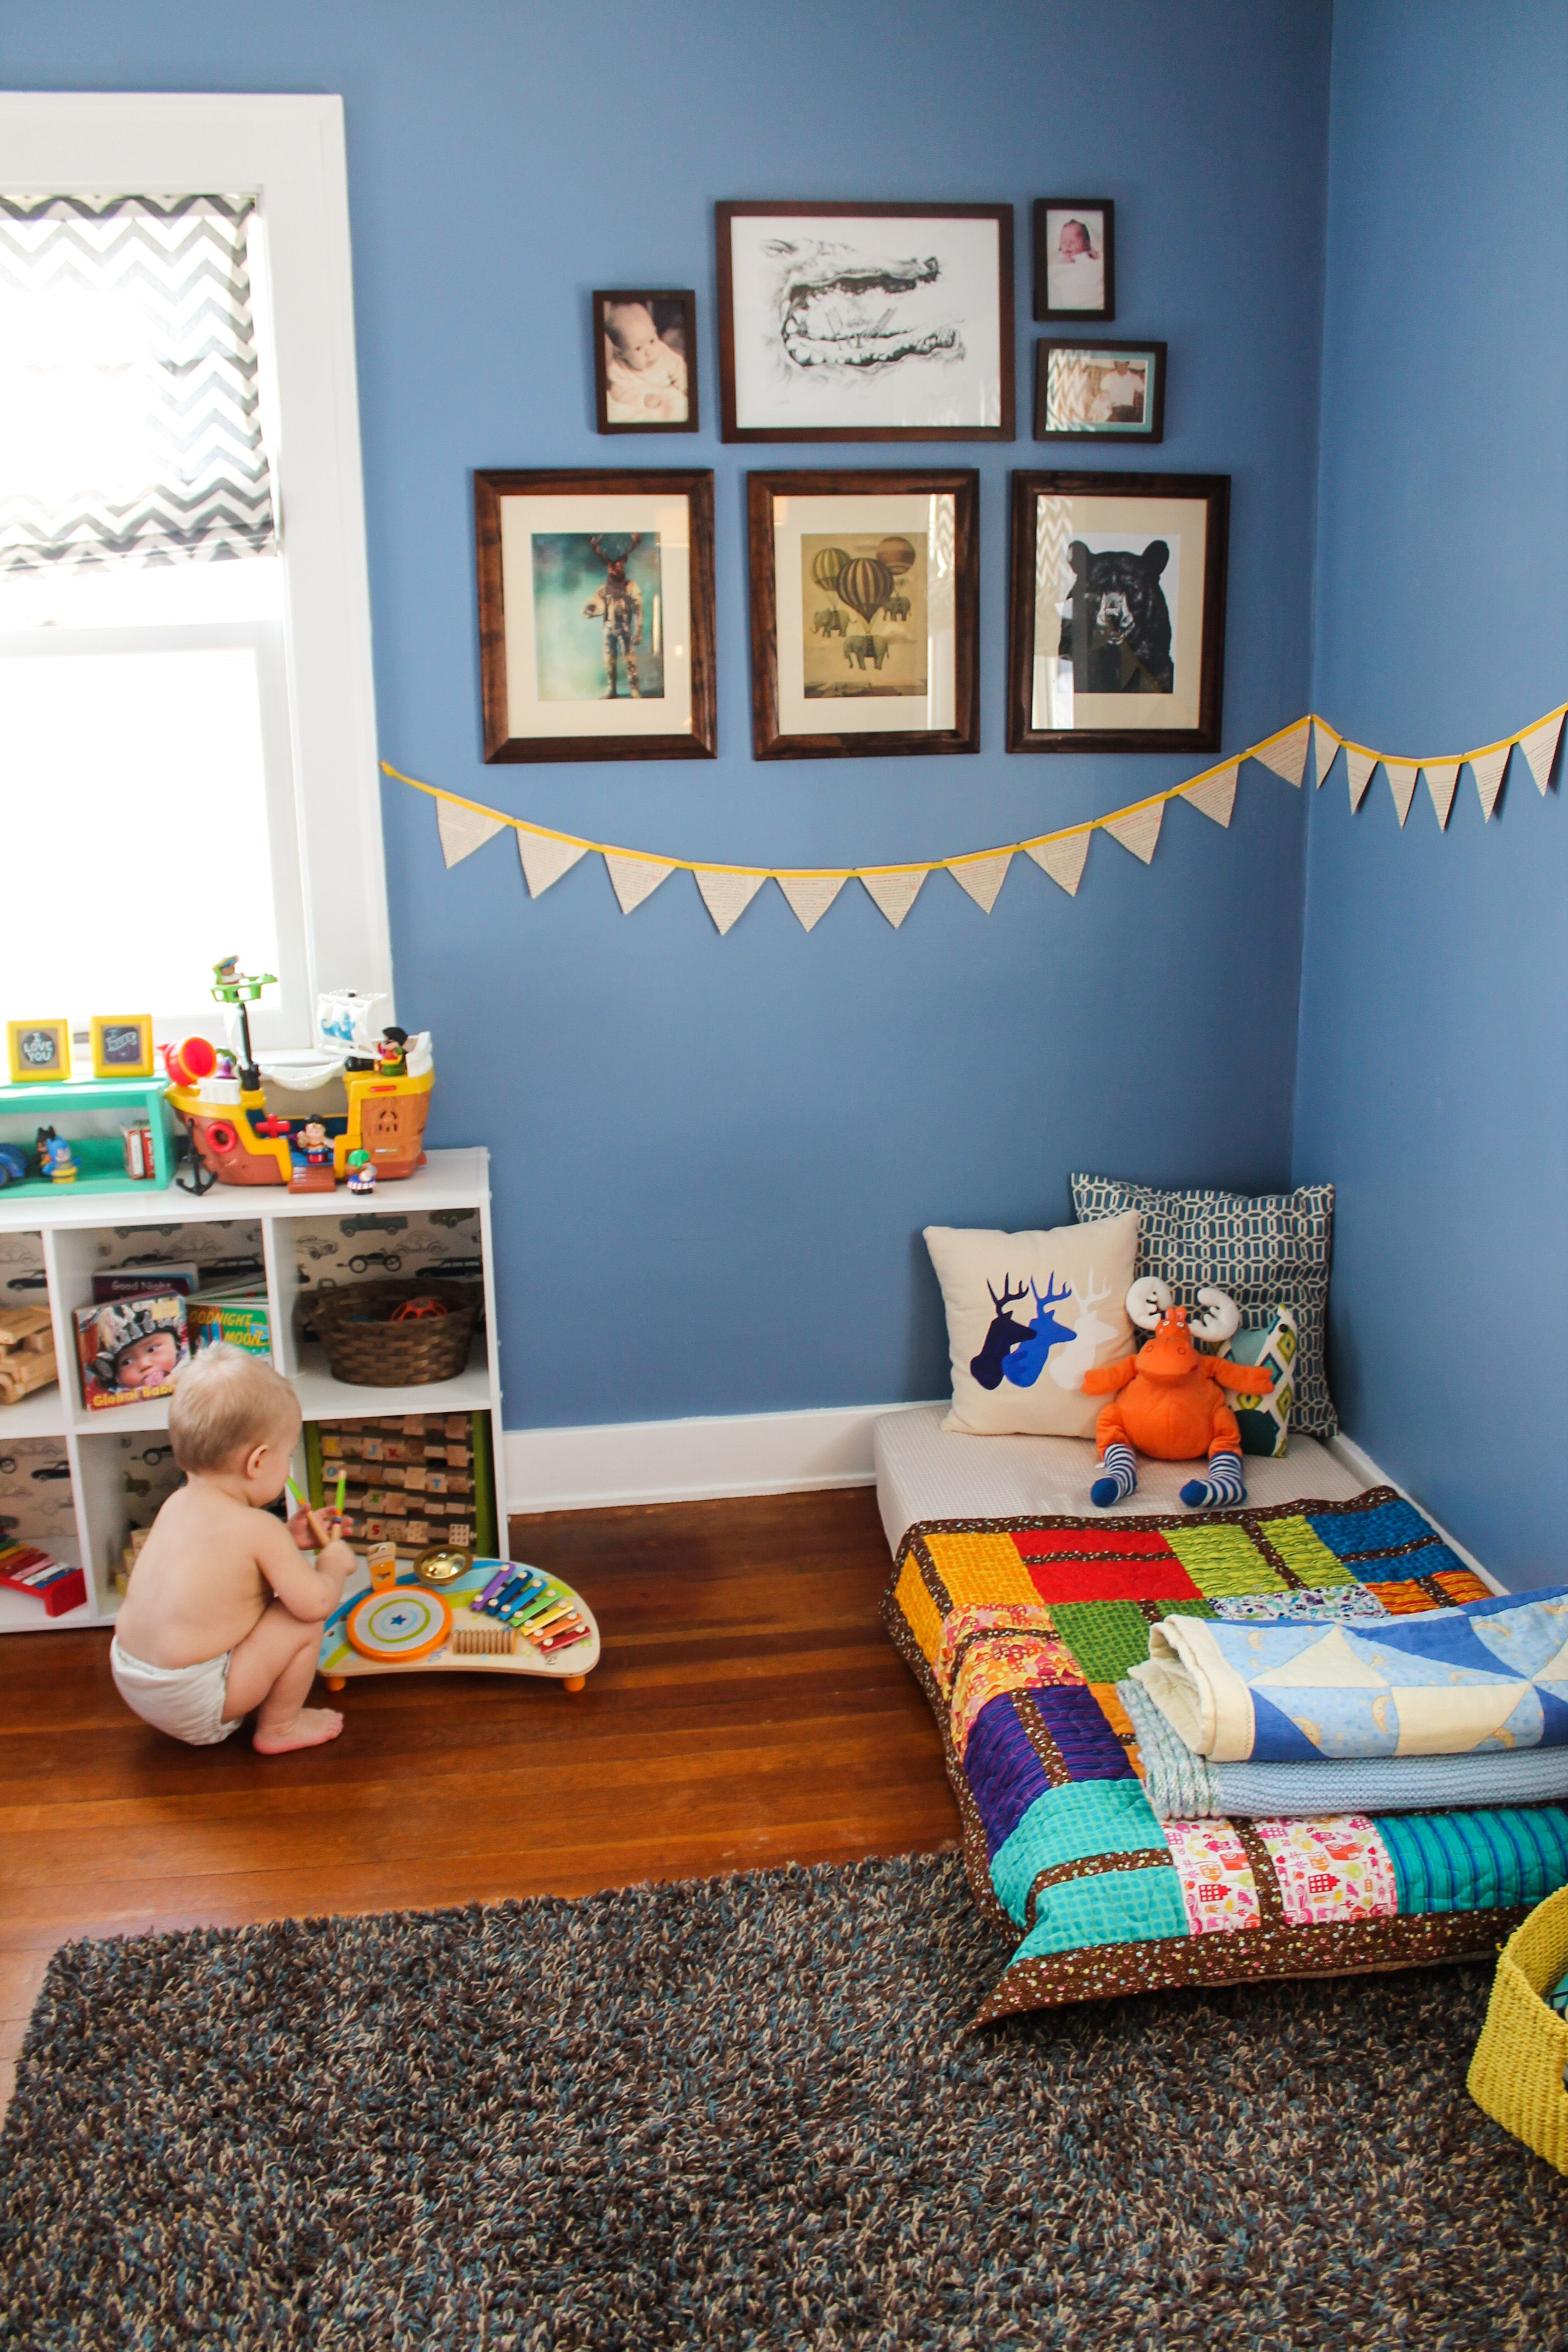 deco y tipo de cama para cuarto niños | Deco hogar | Decoração ...